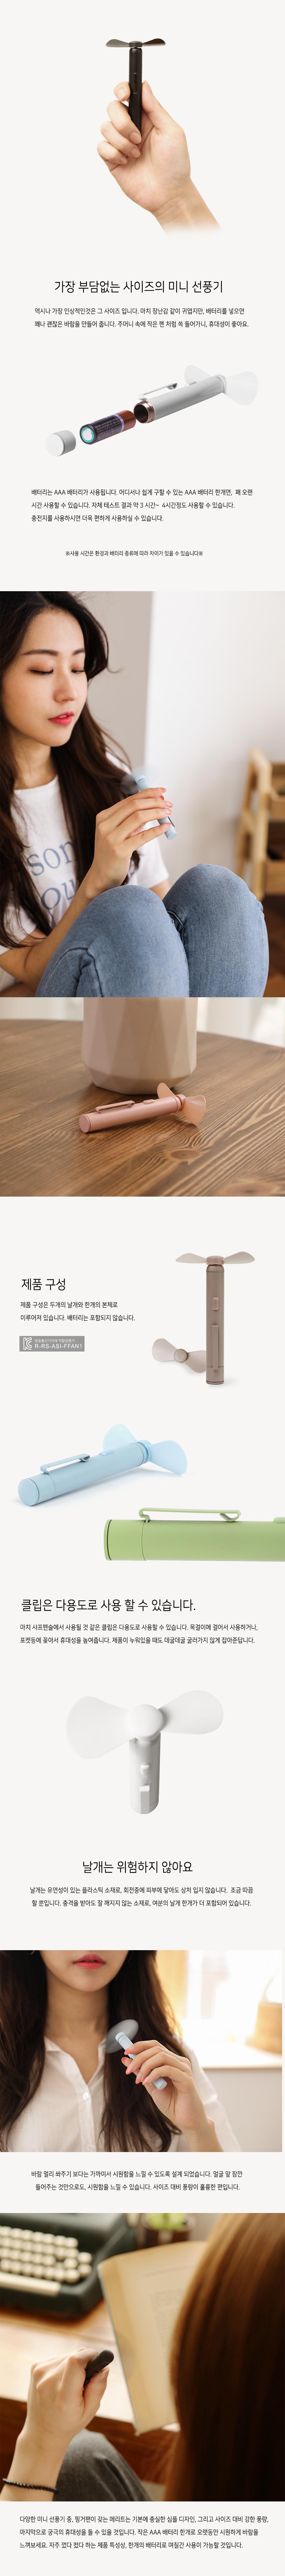 F.FAN 핑거팬 미니선풍기_7cols - 기커스, 7,040원, USB 계절가전, 선풍기